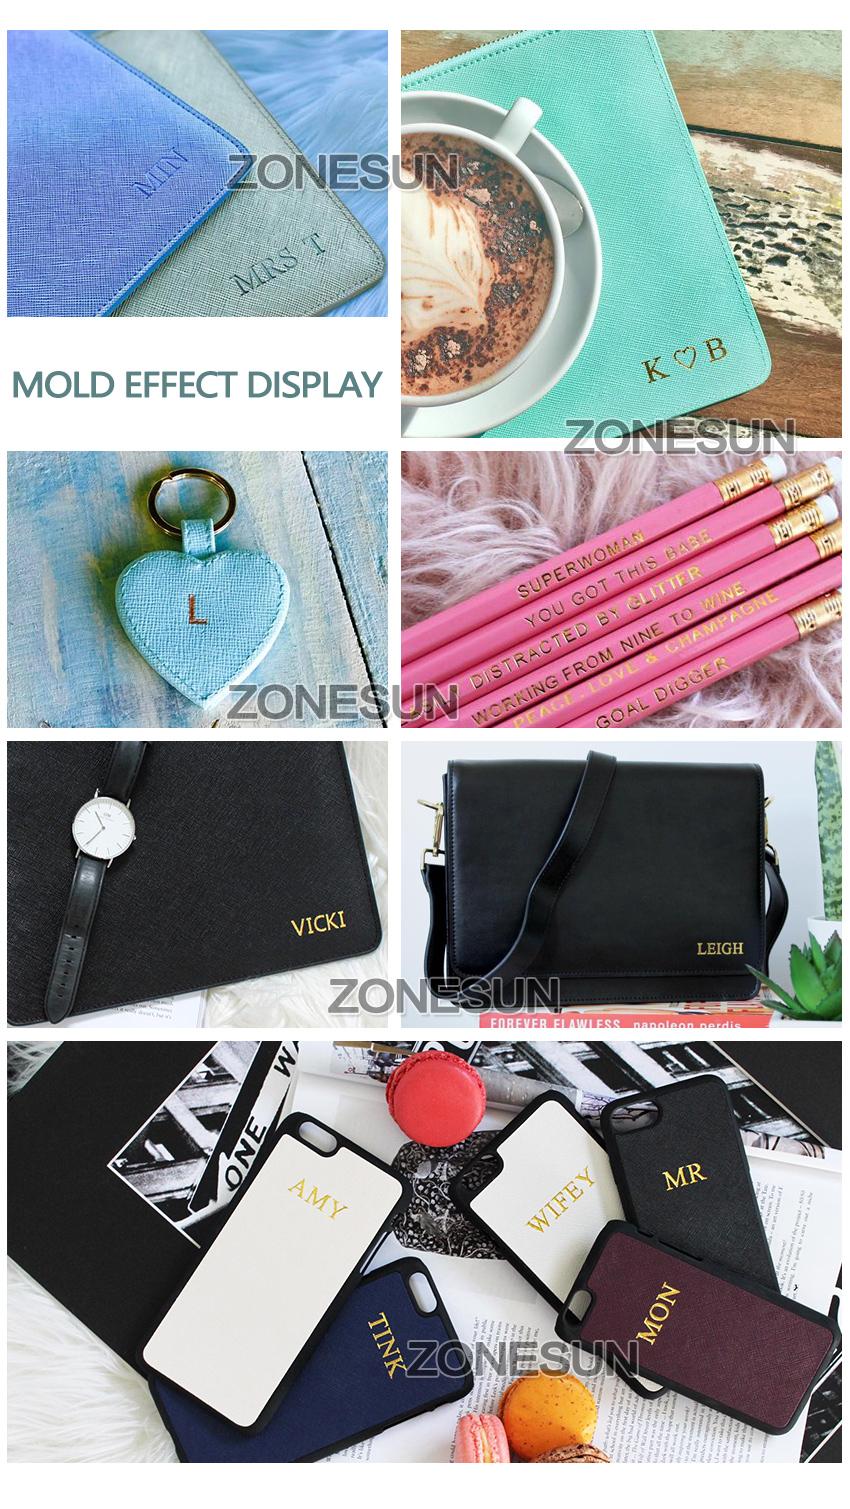 mold-effect